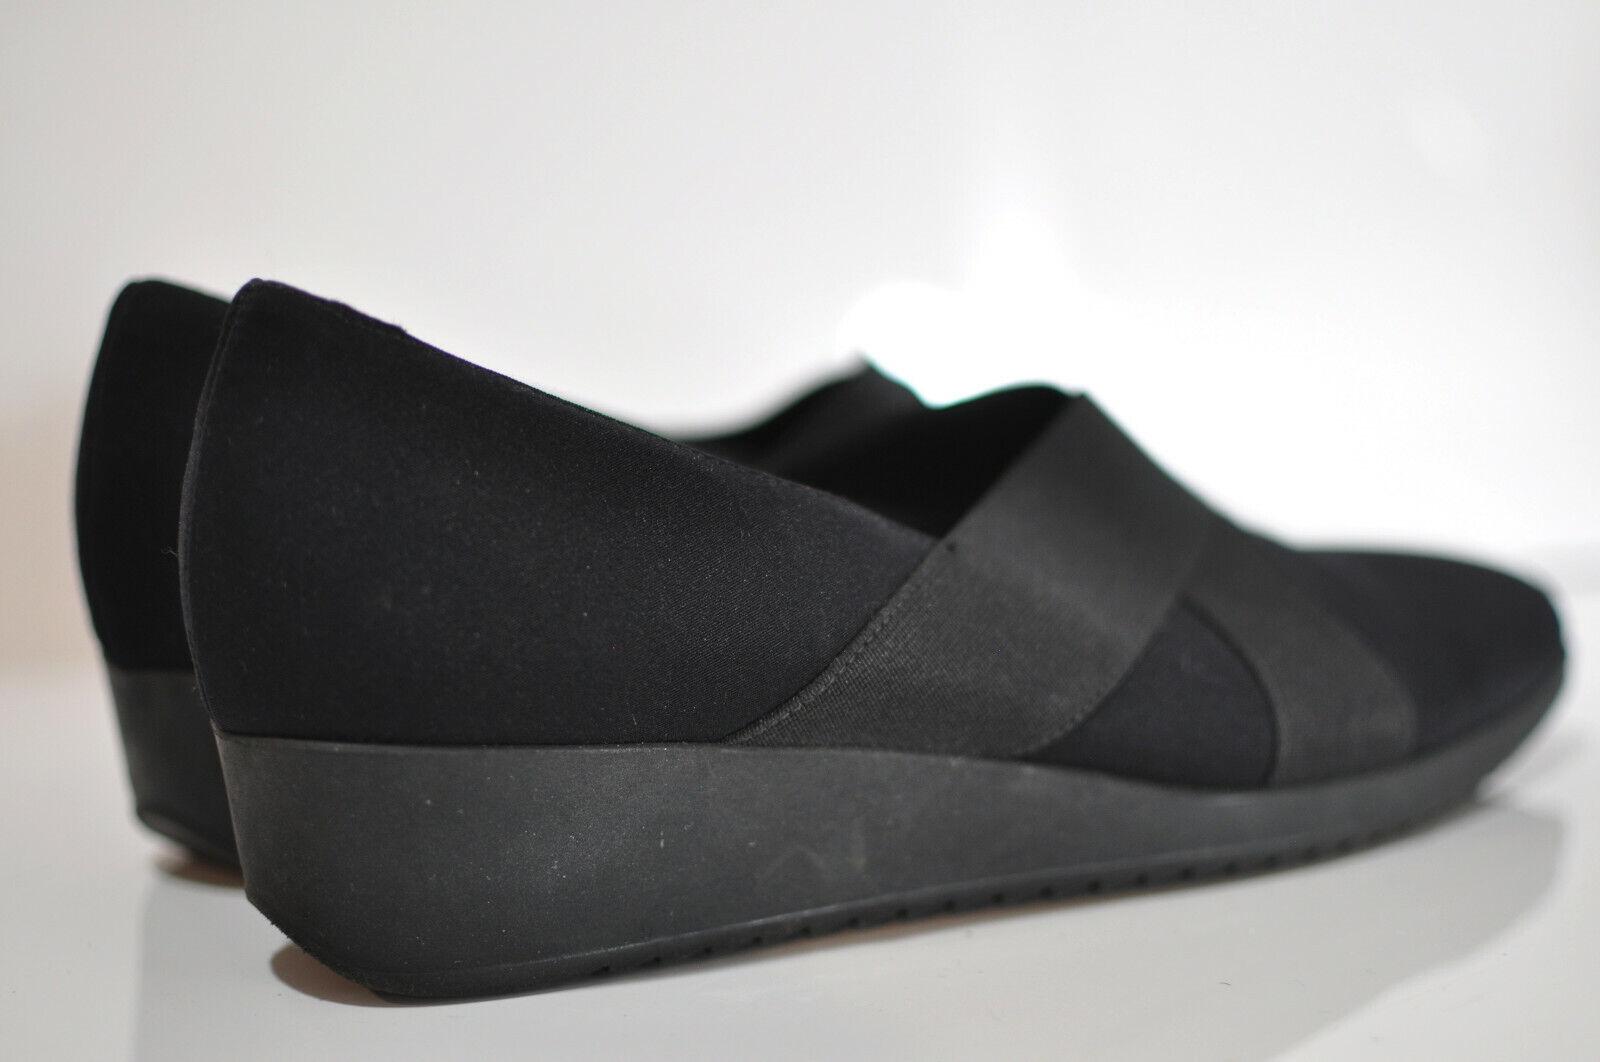 Munro American donna leather slip on wedge 9.5 M fatto in USA